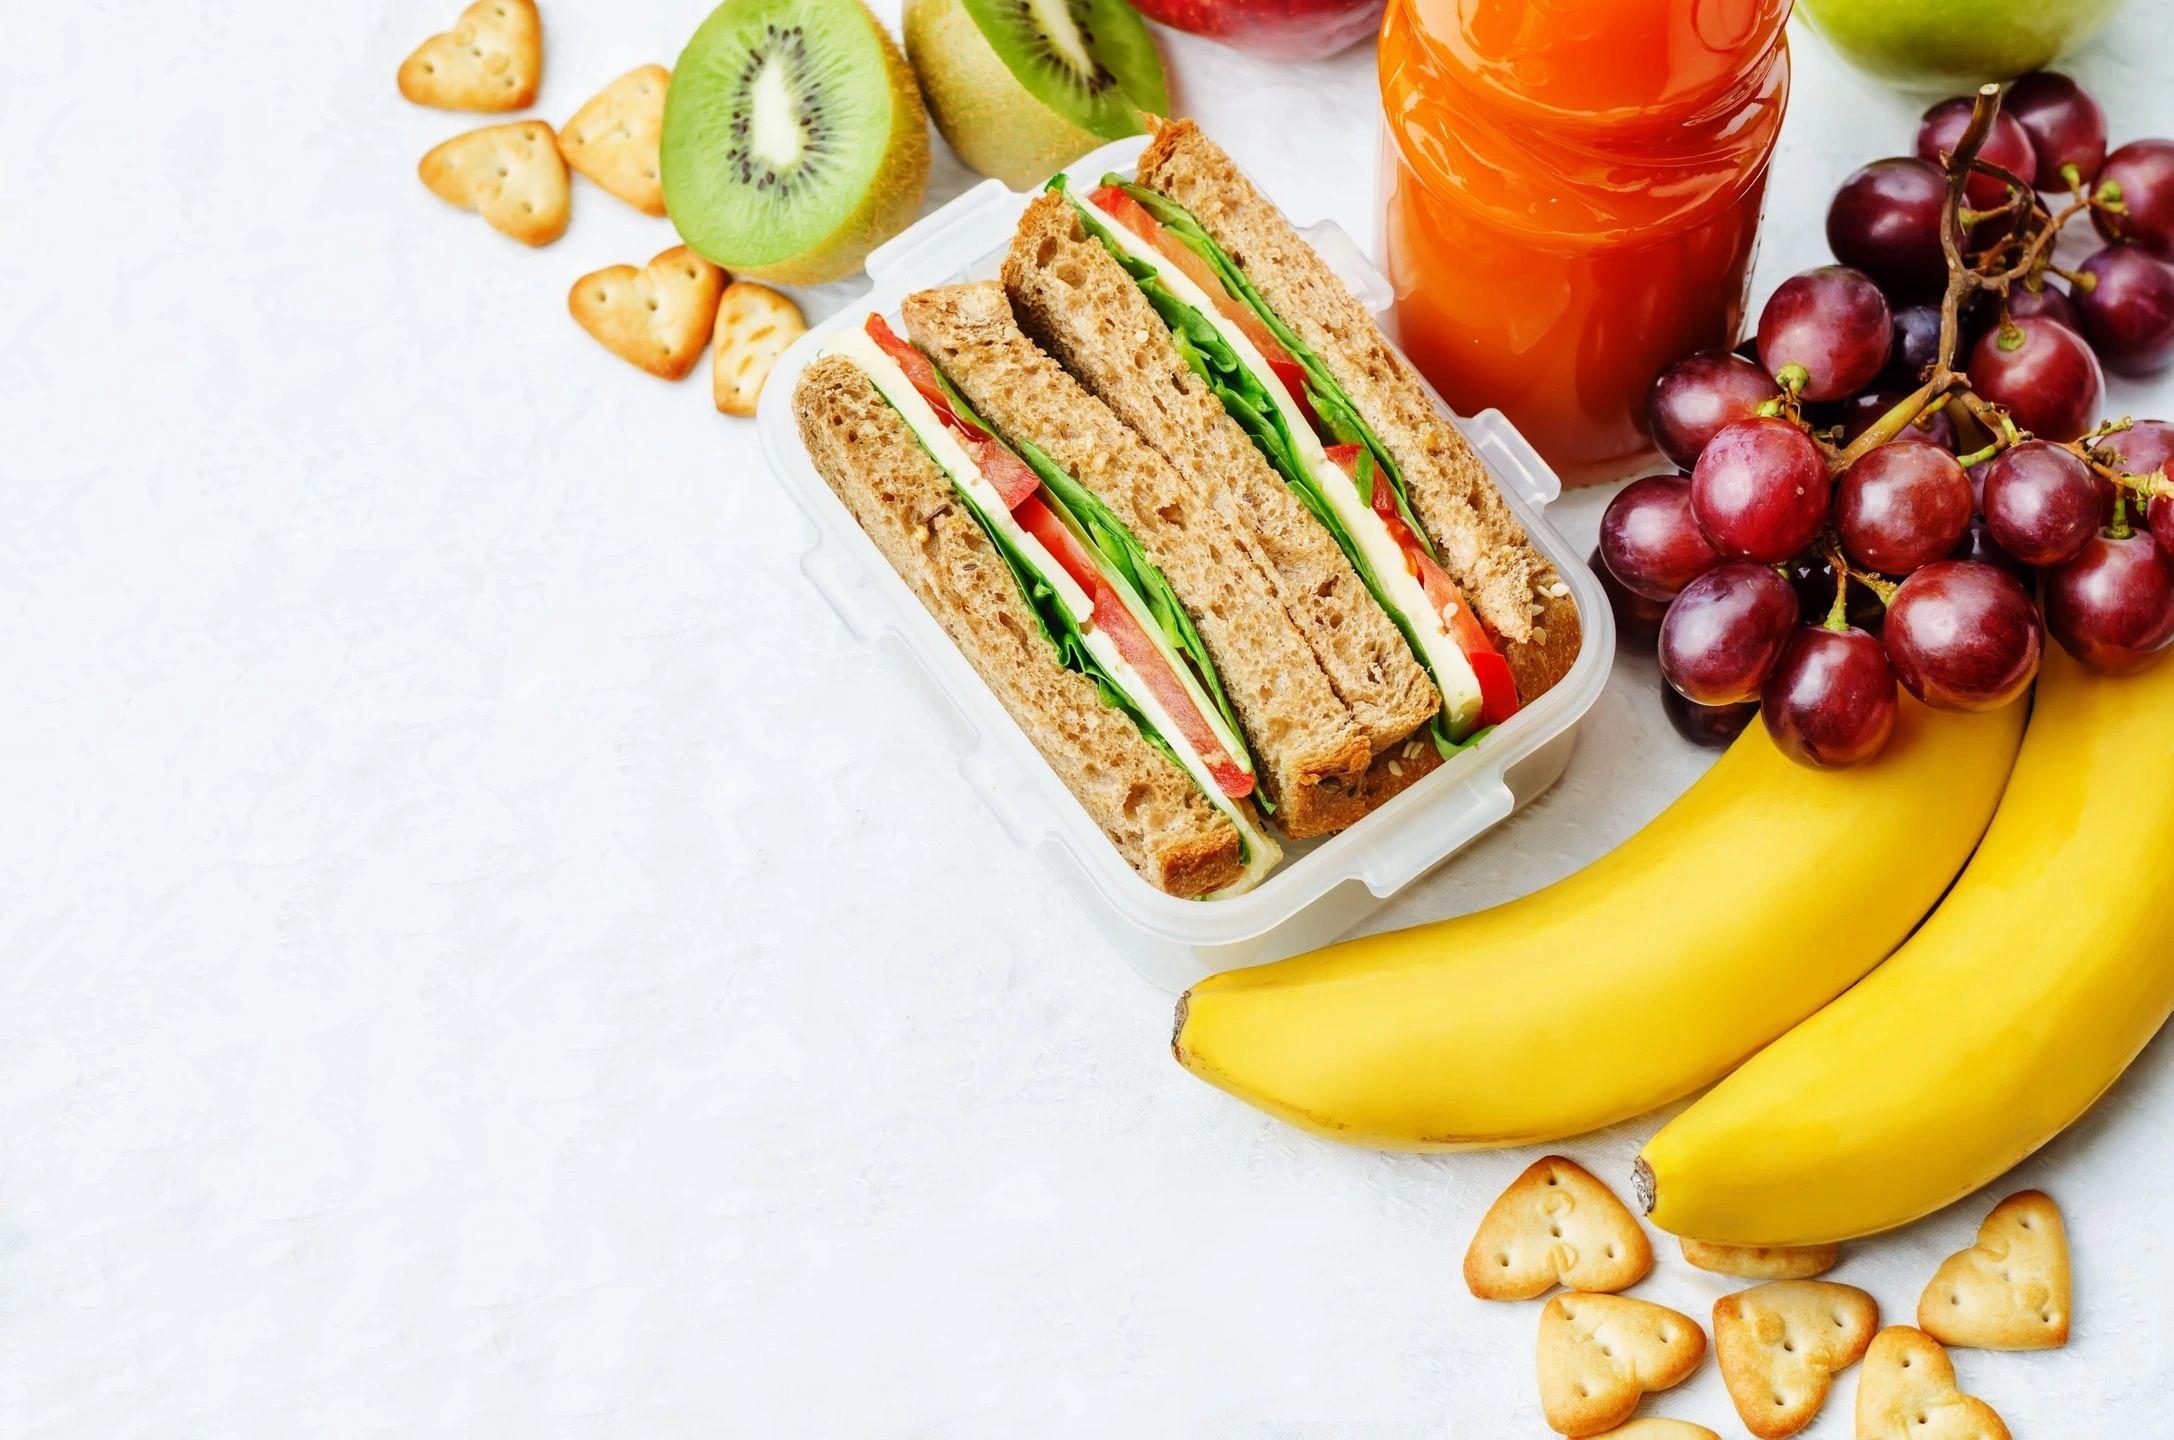 Gluten free, health, nutrition, naturopathic, digestion, food allergy, food sensitivity